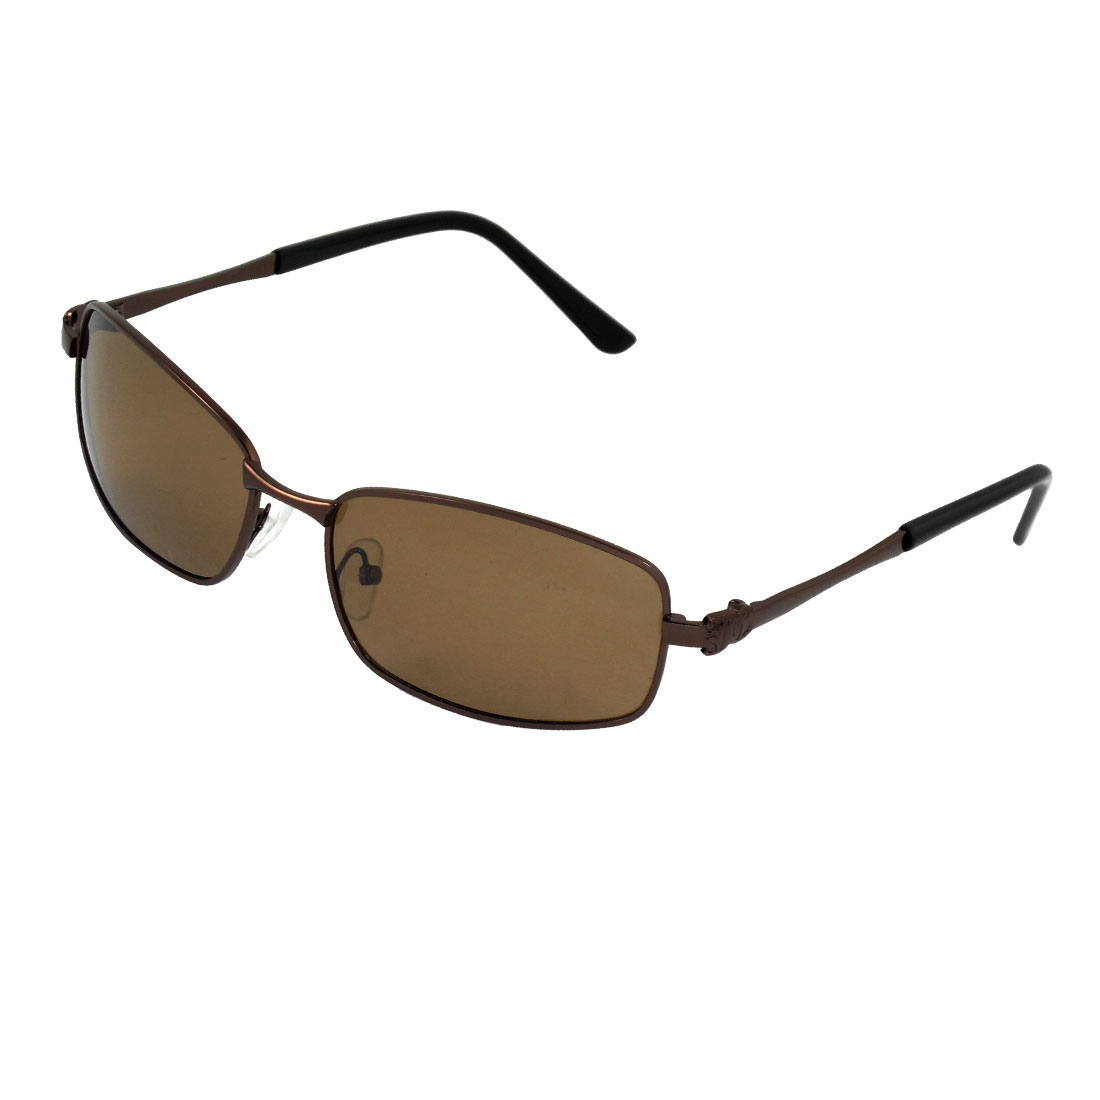 Men Coffee Color Metal Plastic Arm Rectangle Lens Polarized Sunglasses